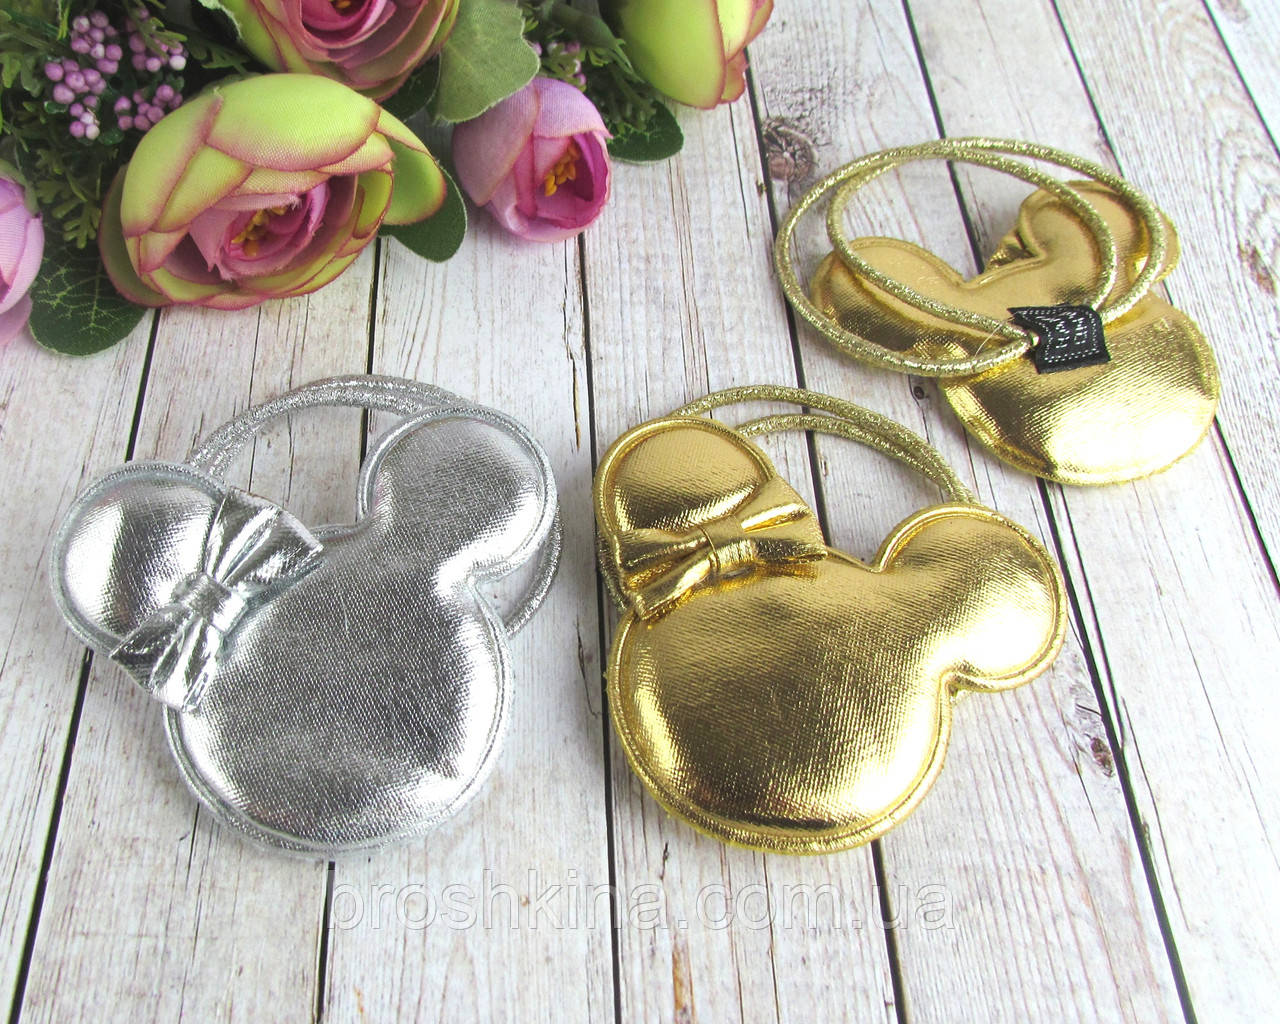 Резинки для волос Микки Маусы под кожу золото+ серебро 12 шт/уп.